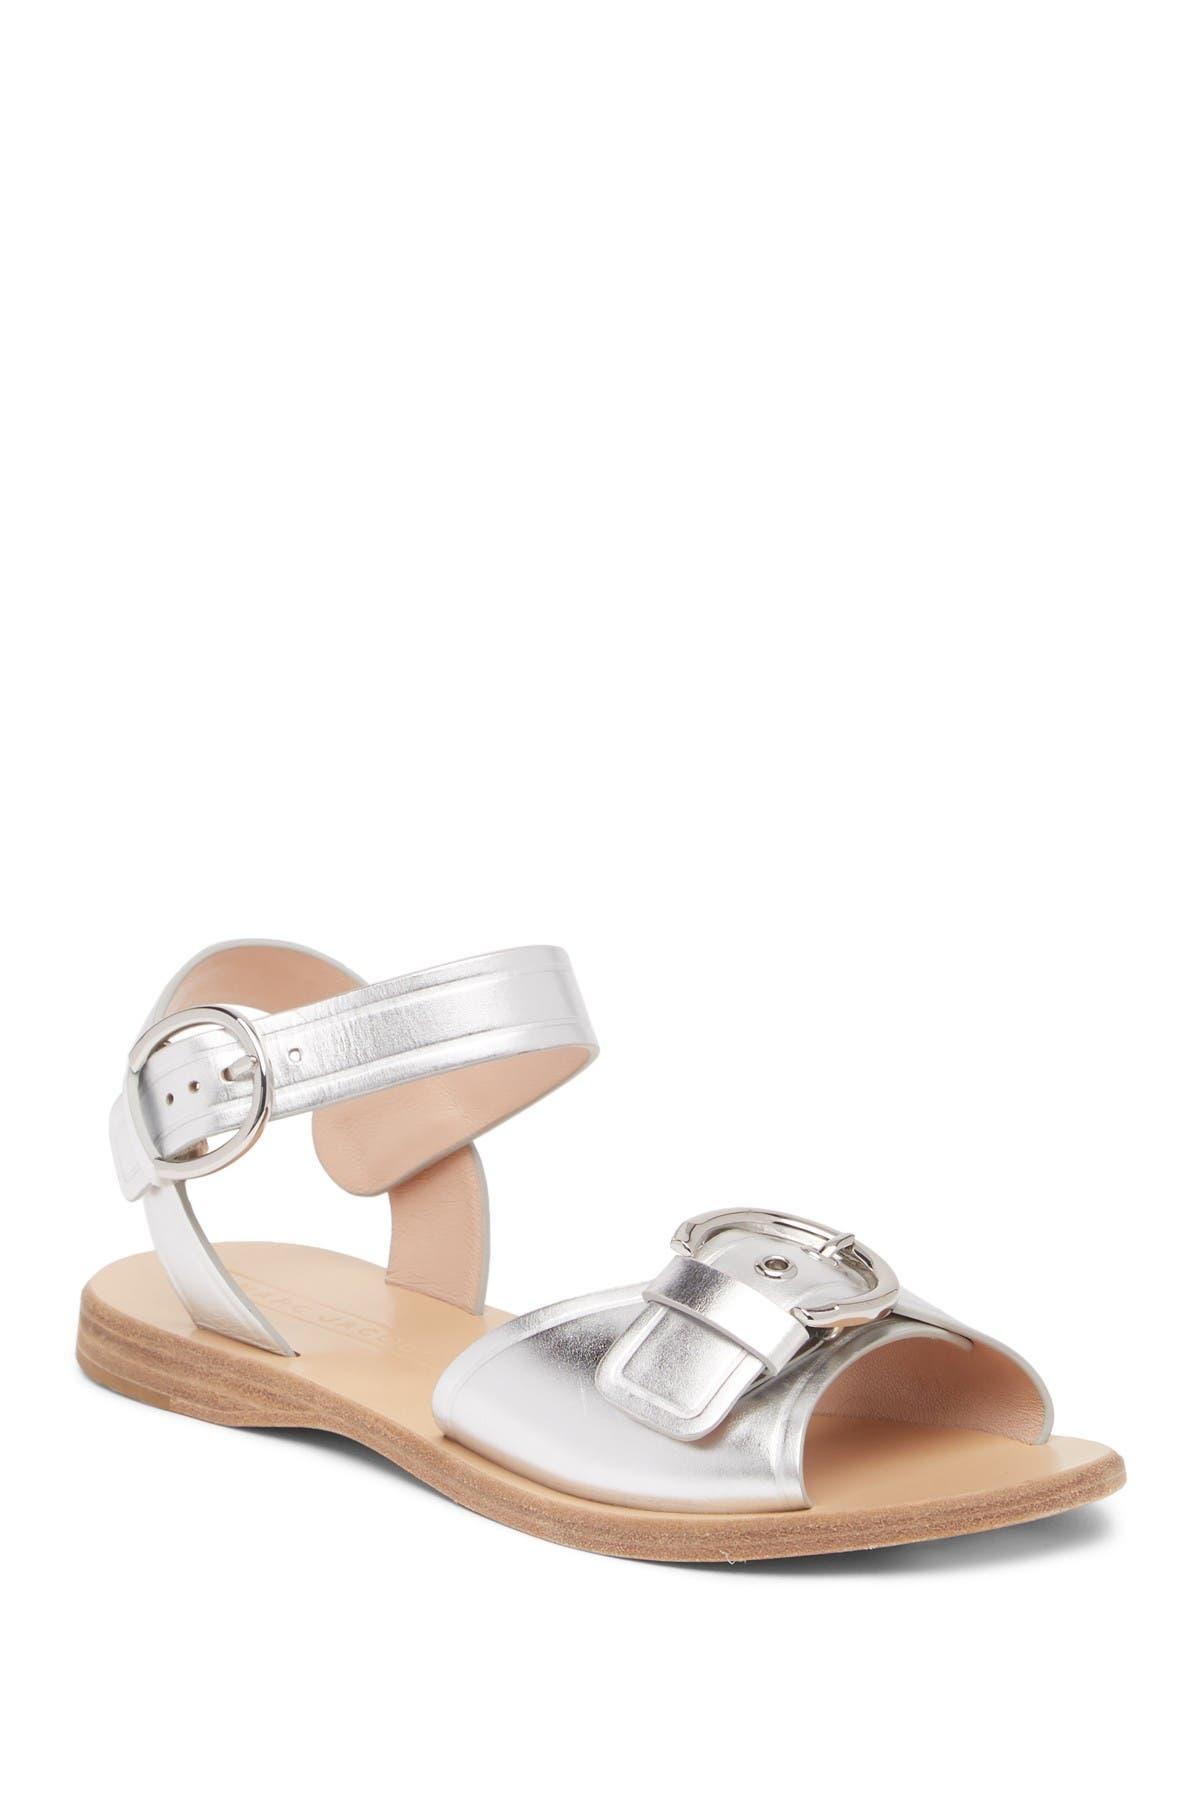 Image of Marc Jacobs Horizon Flat Leather Sandal